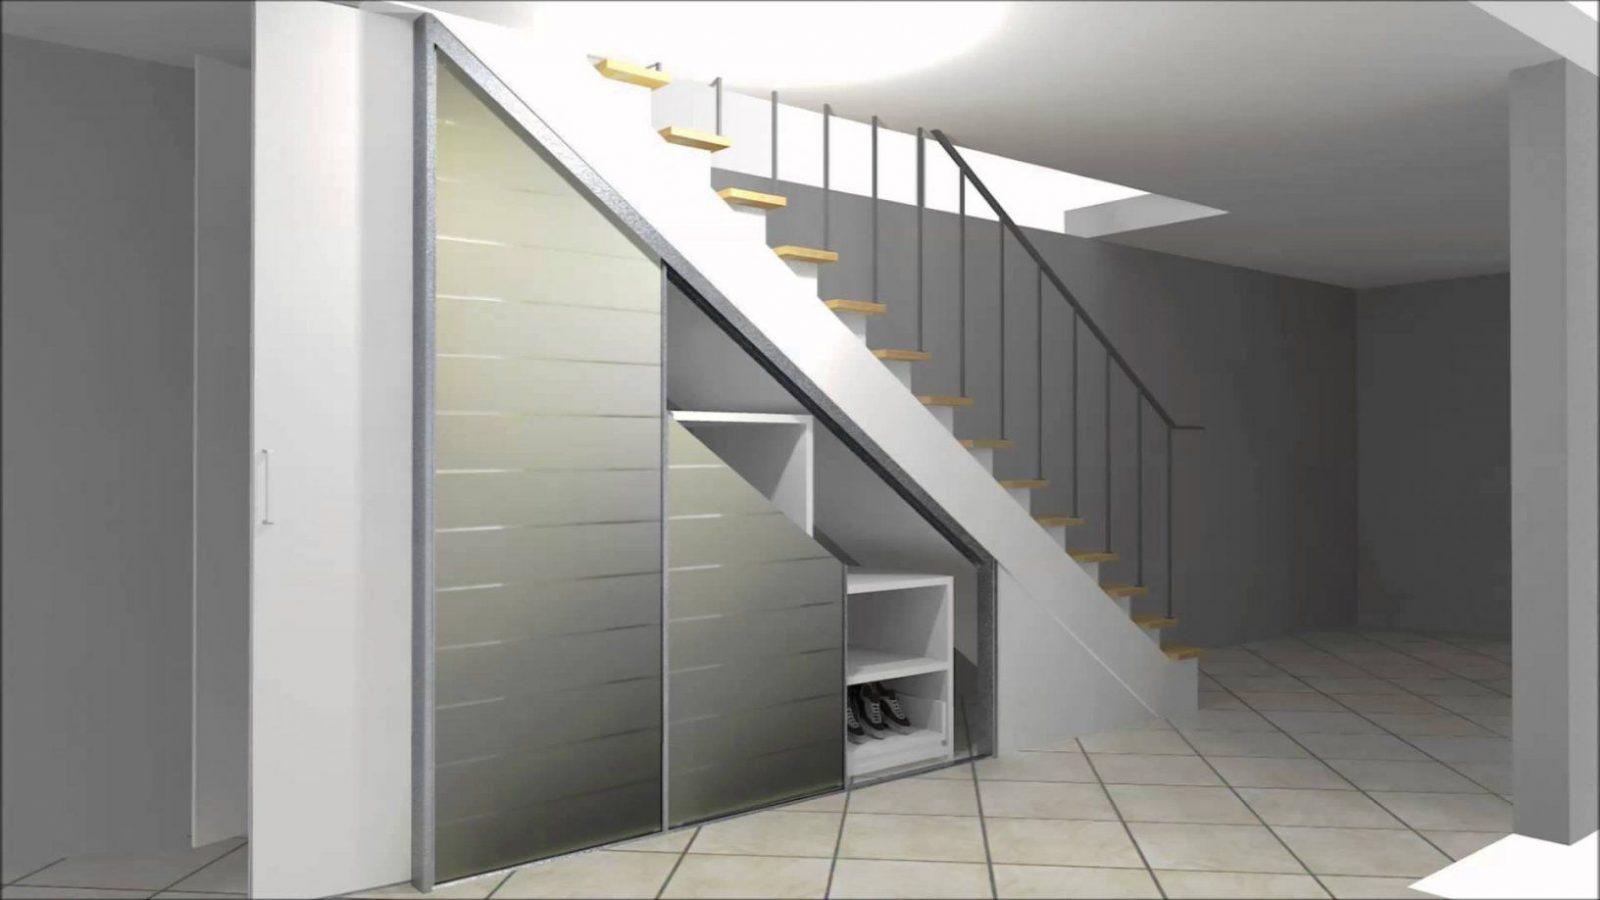 schrank unter treppe bauanleitung | haus design ideen